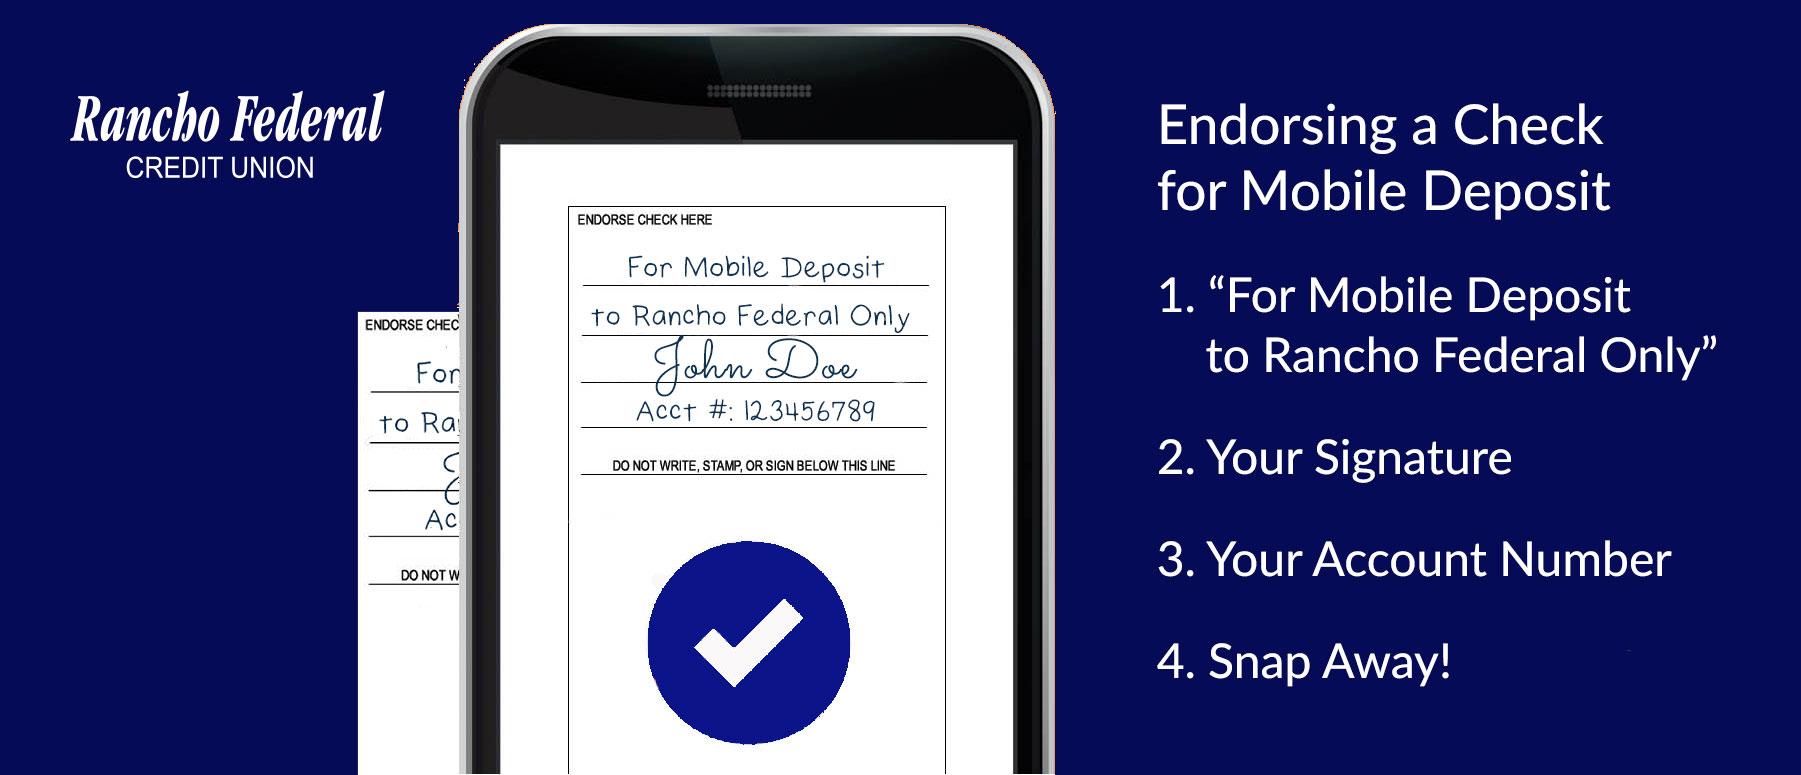 Remote Deposit Endorsement